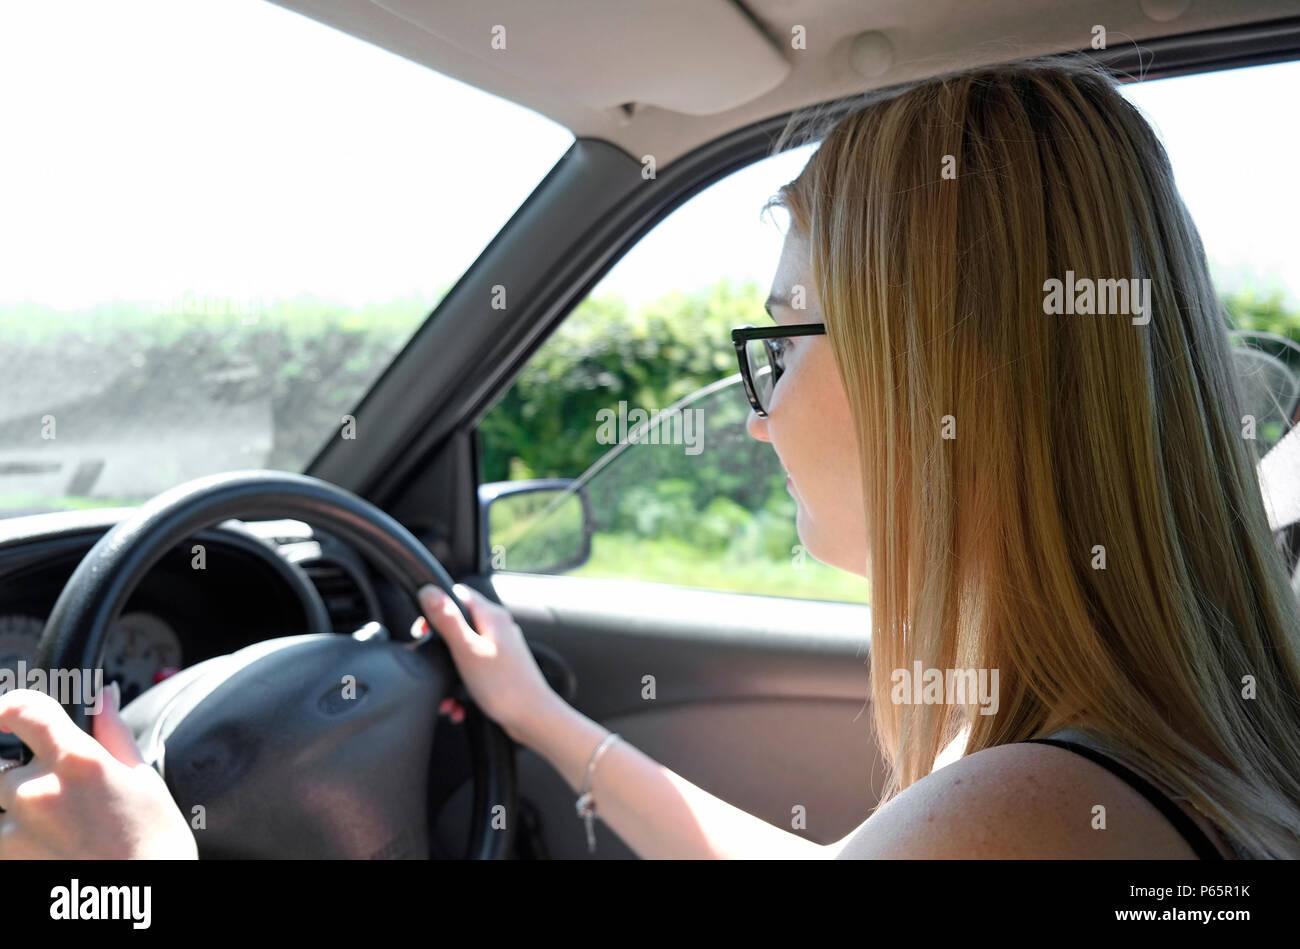 female teenage driver, driving motor vehicle, norfolk, england - Stock Image